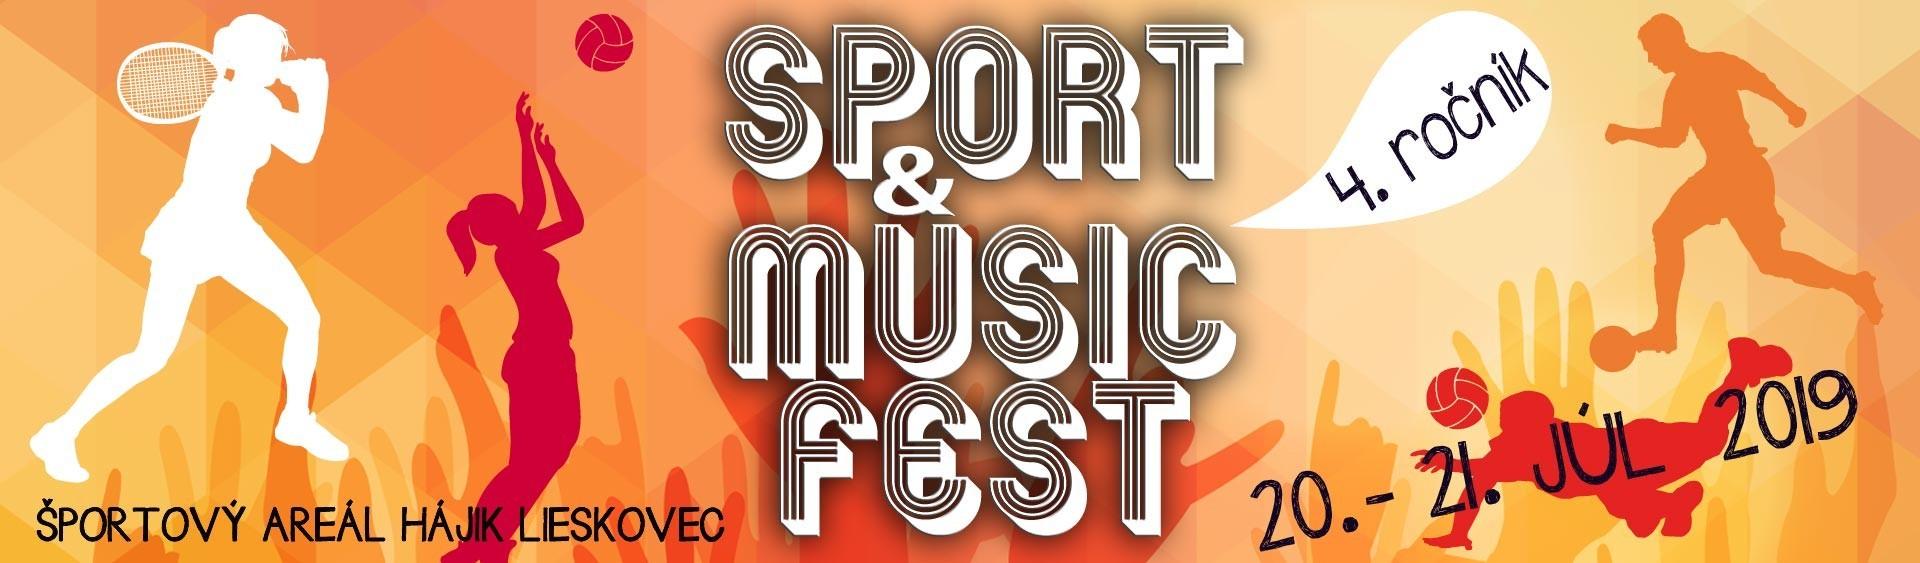 Večerný beh SPORT&MUSIC FEST